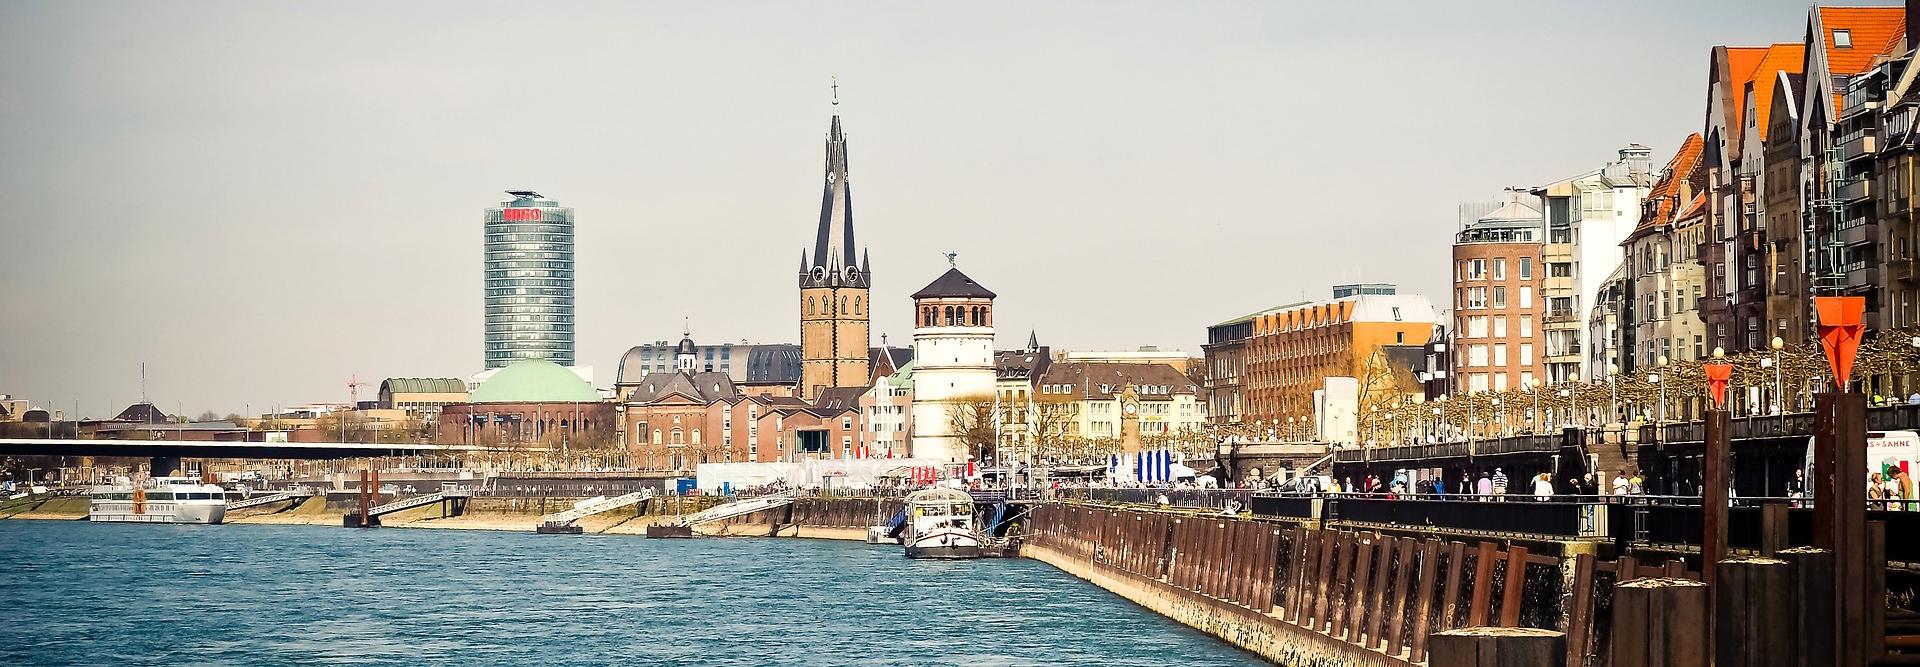 Druckerei Düsseldorf